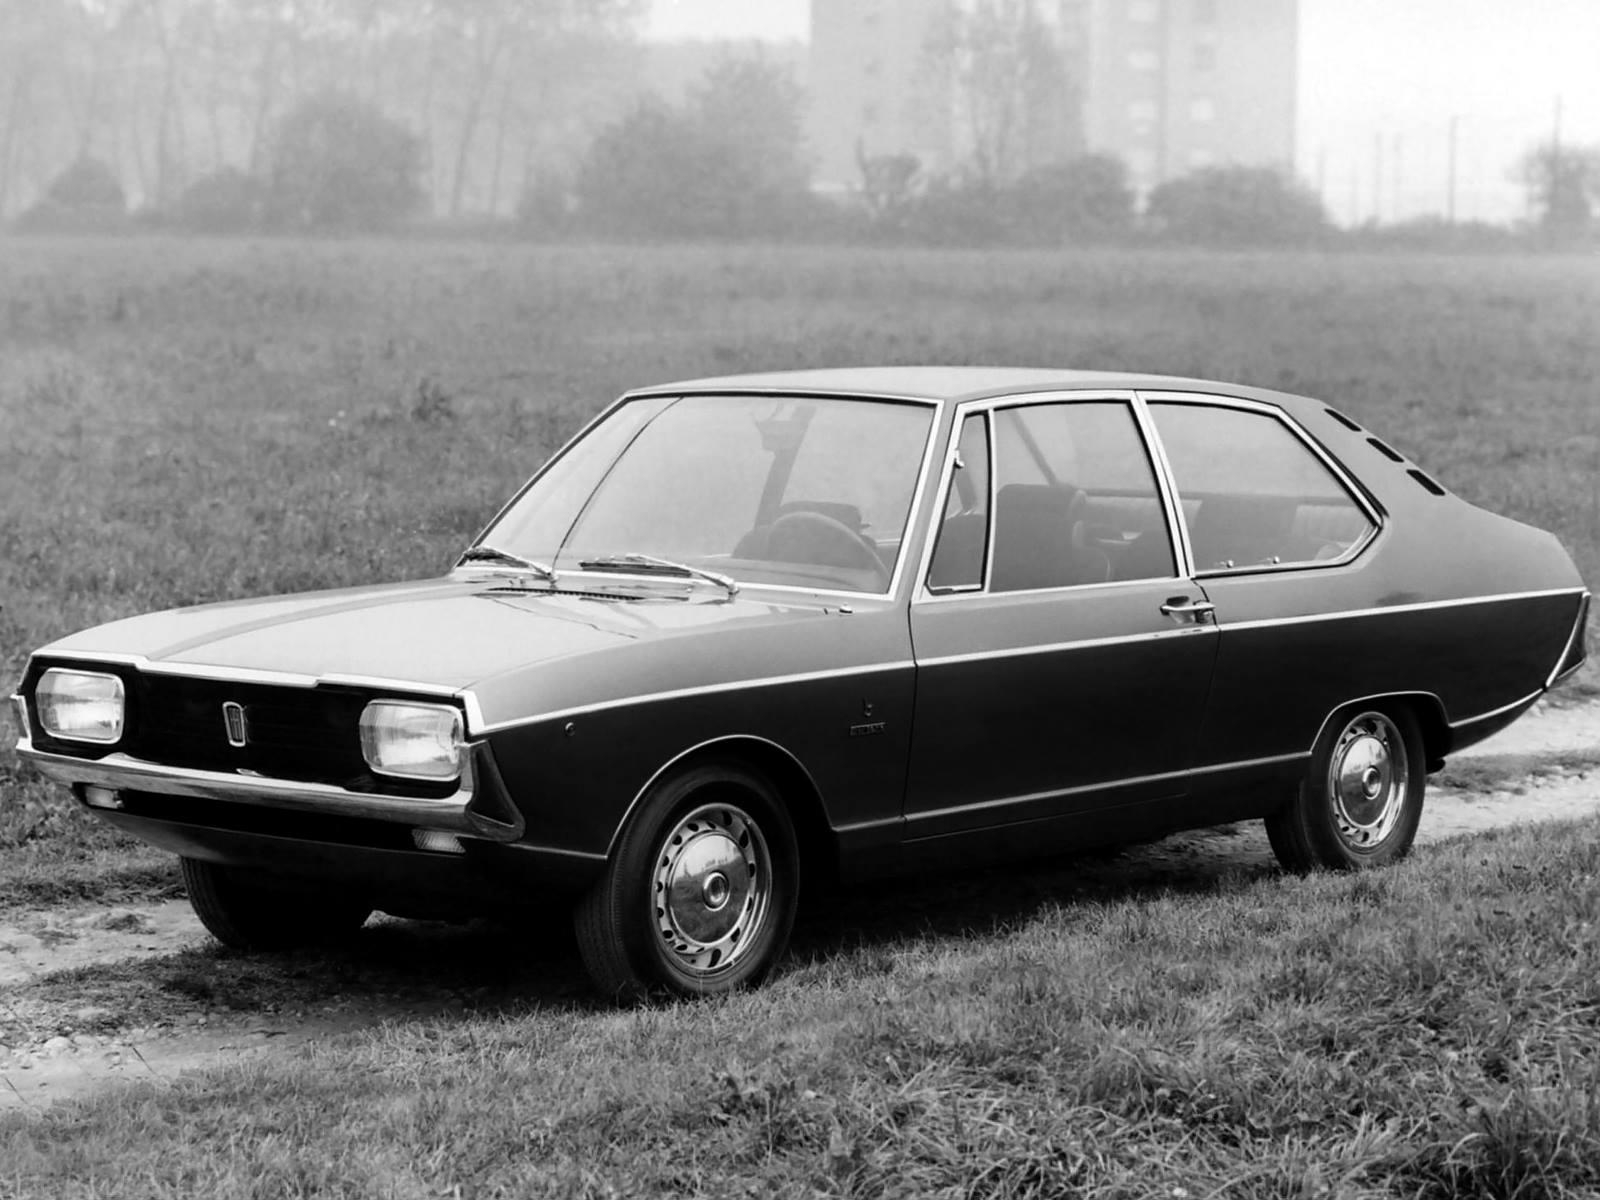 Fiat-125-Executive-carr-Bertone-1967-1